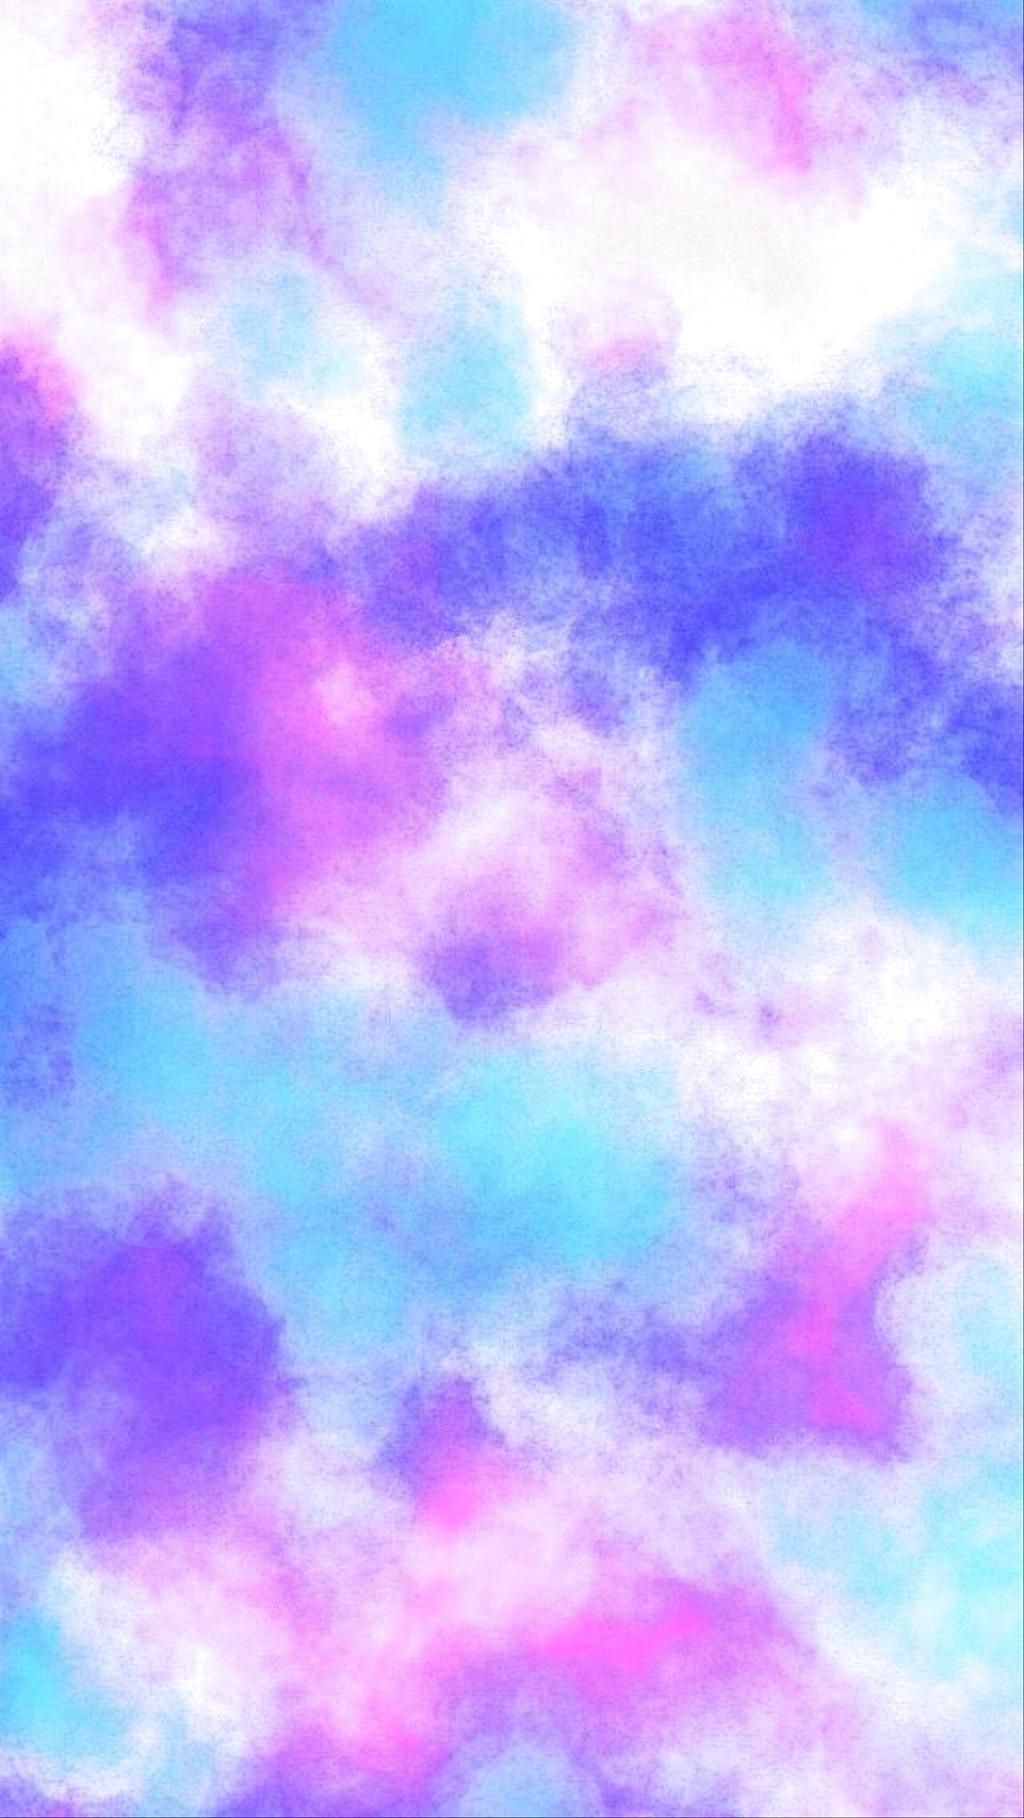 Ciel Bleu Violet Violet Rose Motif Fonds Telephone Hd Bluewallpaper Bluewallpaperiphone Rainbow Wallpaper Unicorn Wallpaper Tie Dye Wallpaper